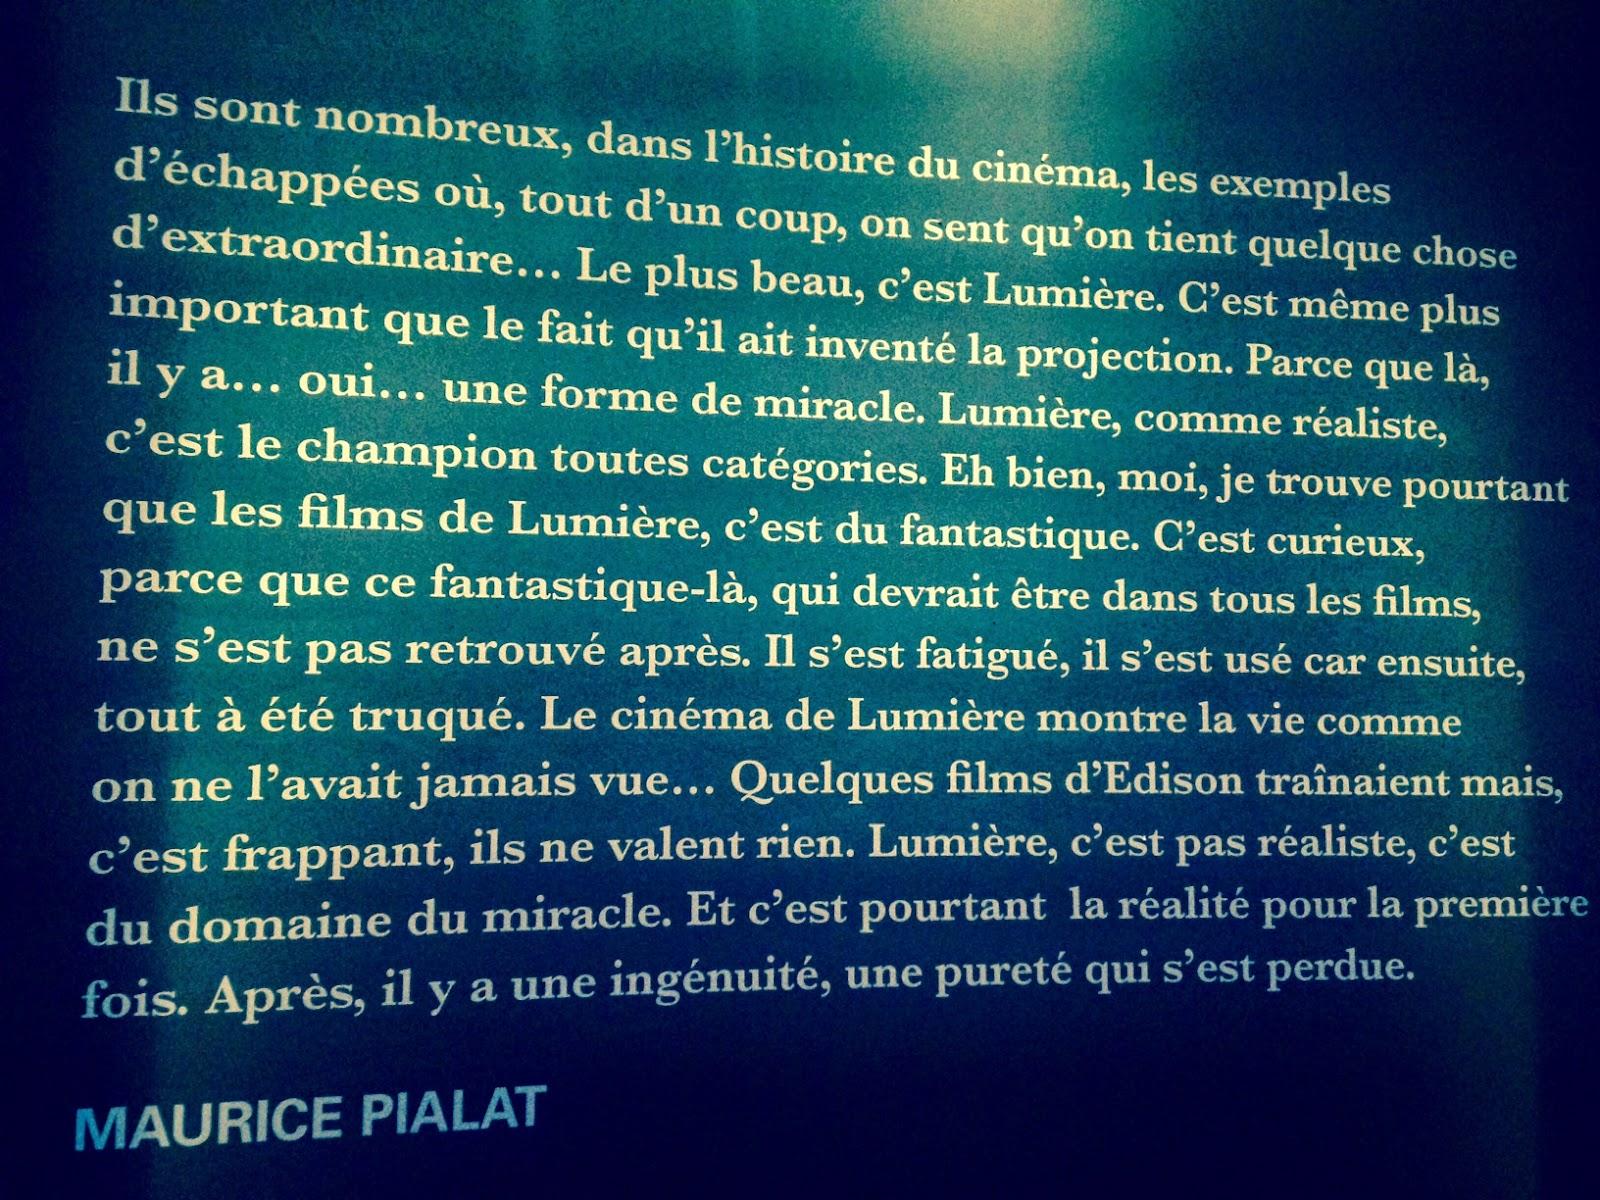 texte+de+Pialat+expo+Lumière.jpg